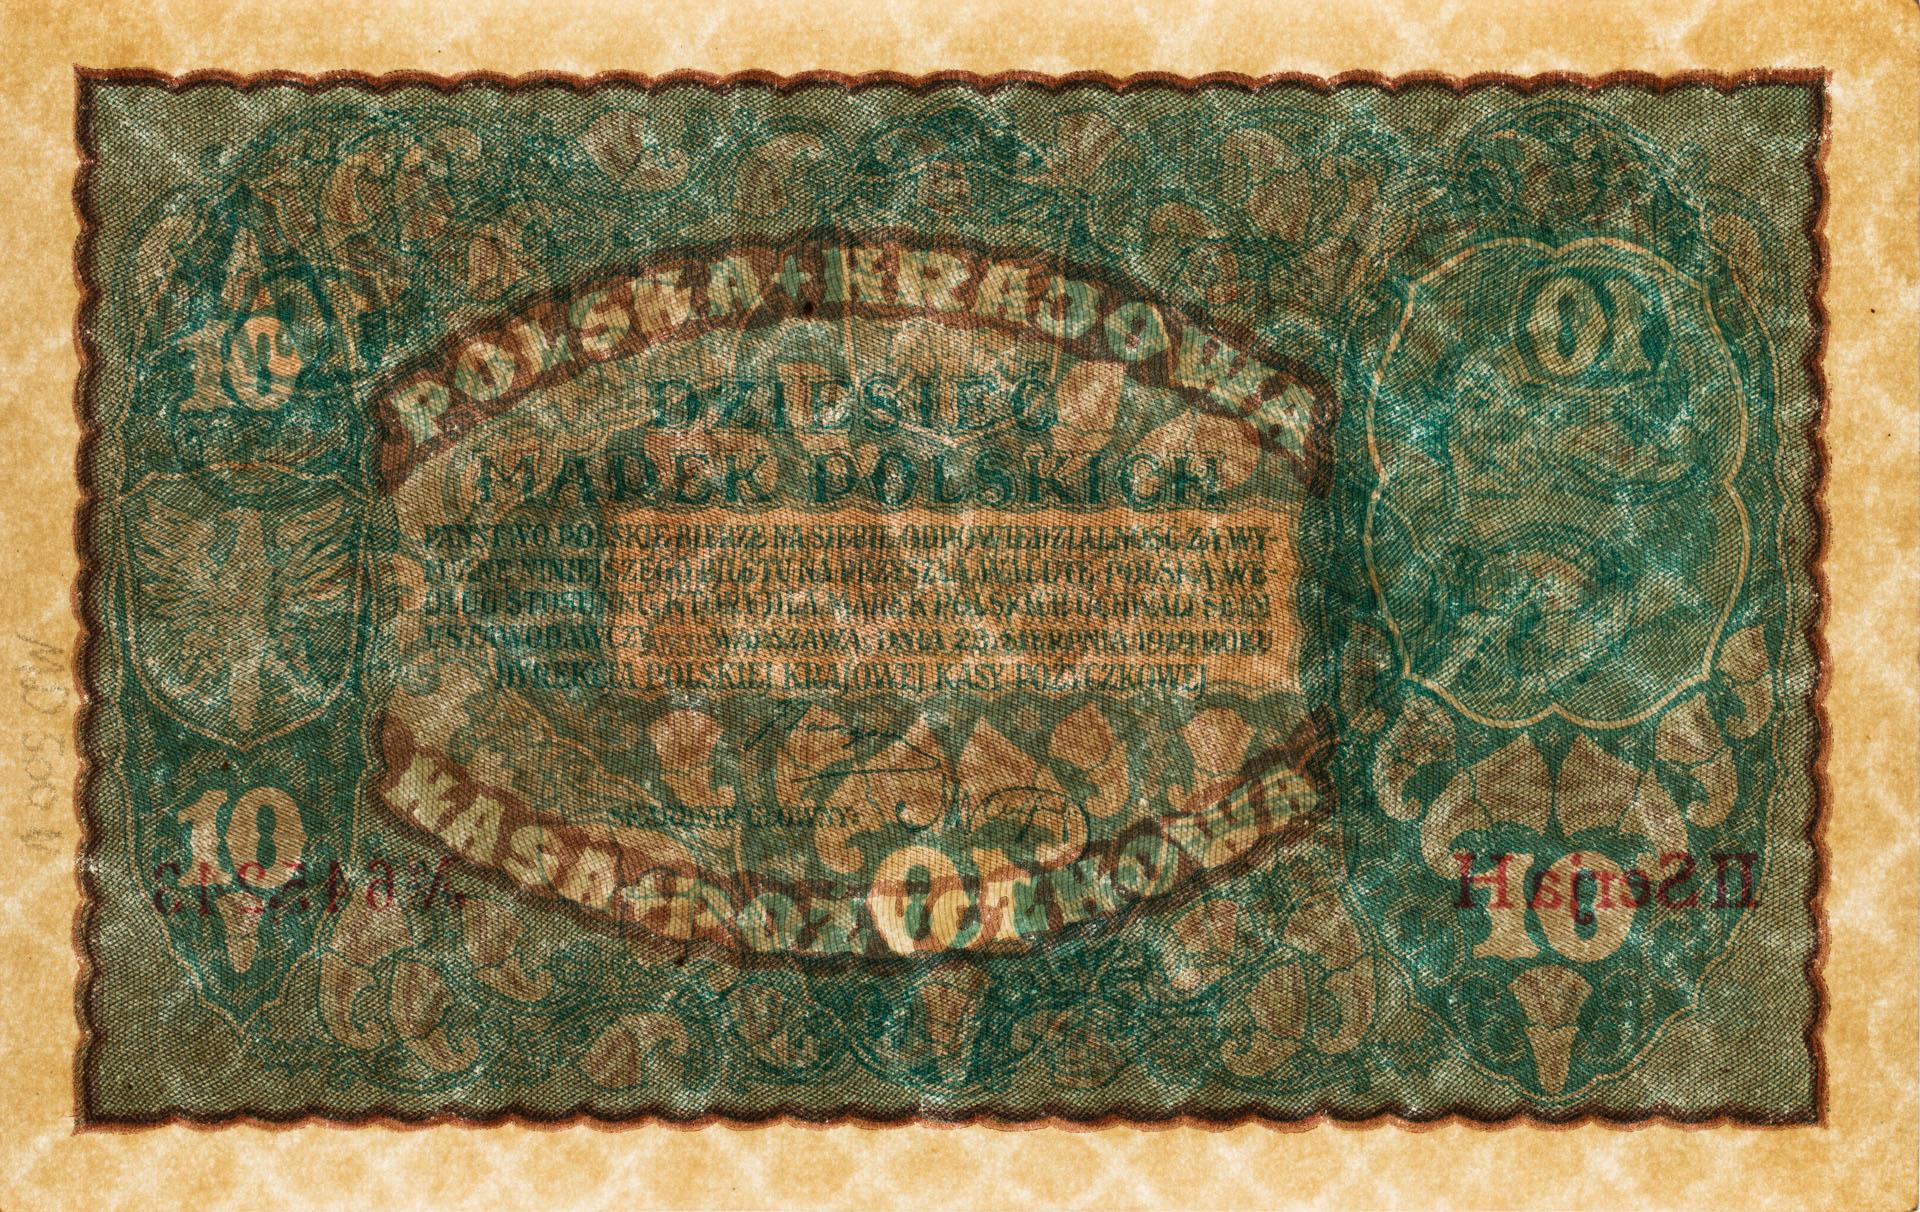 Banknot 10 marek polskich